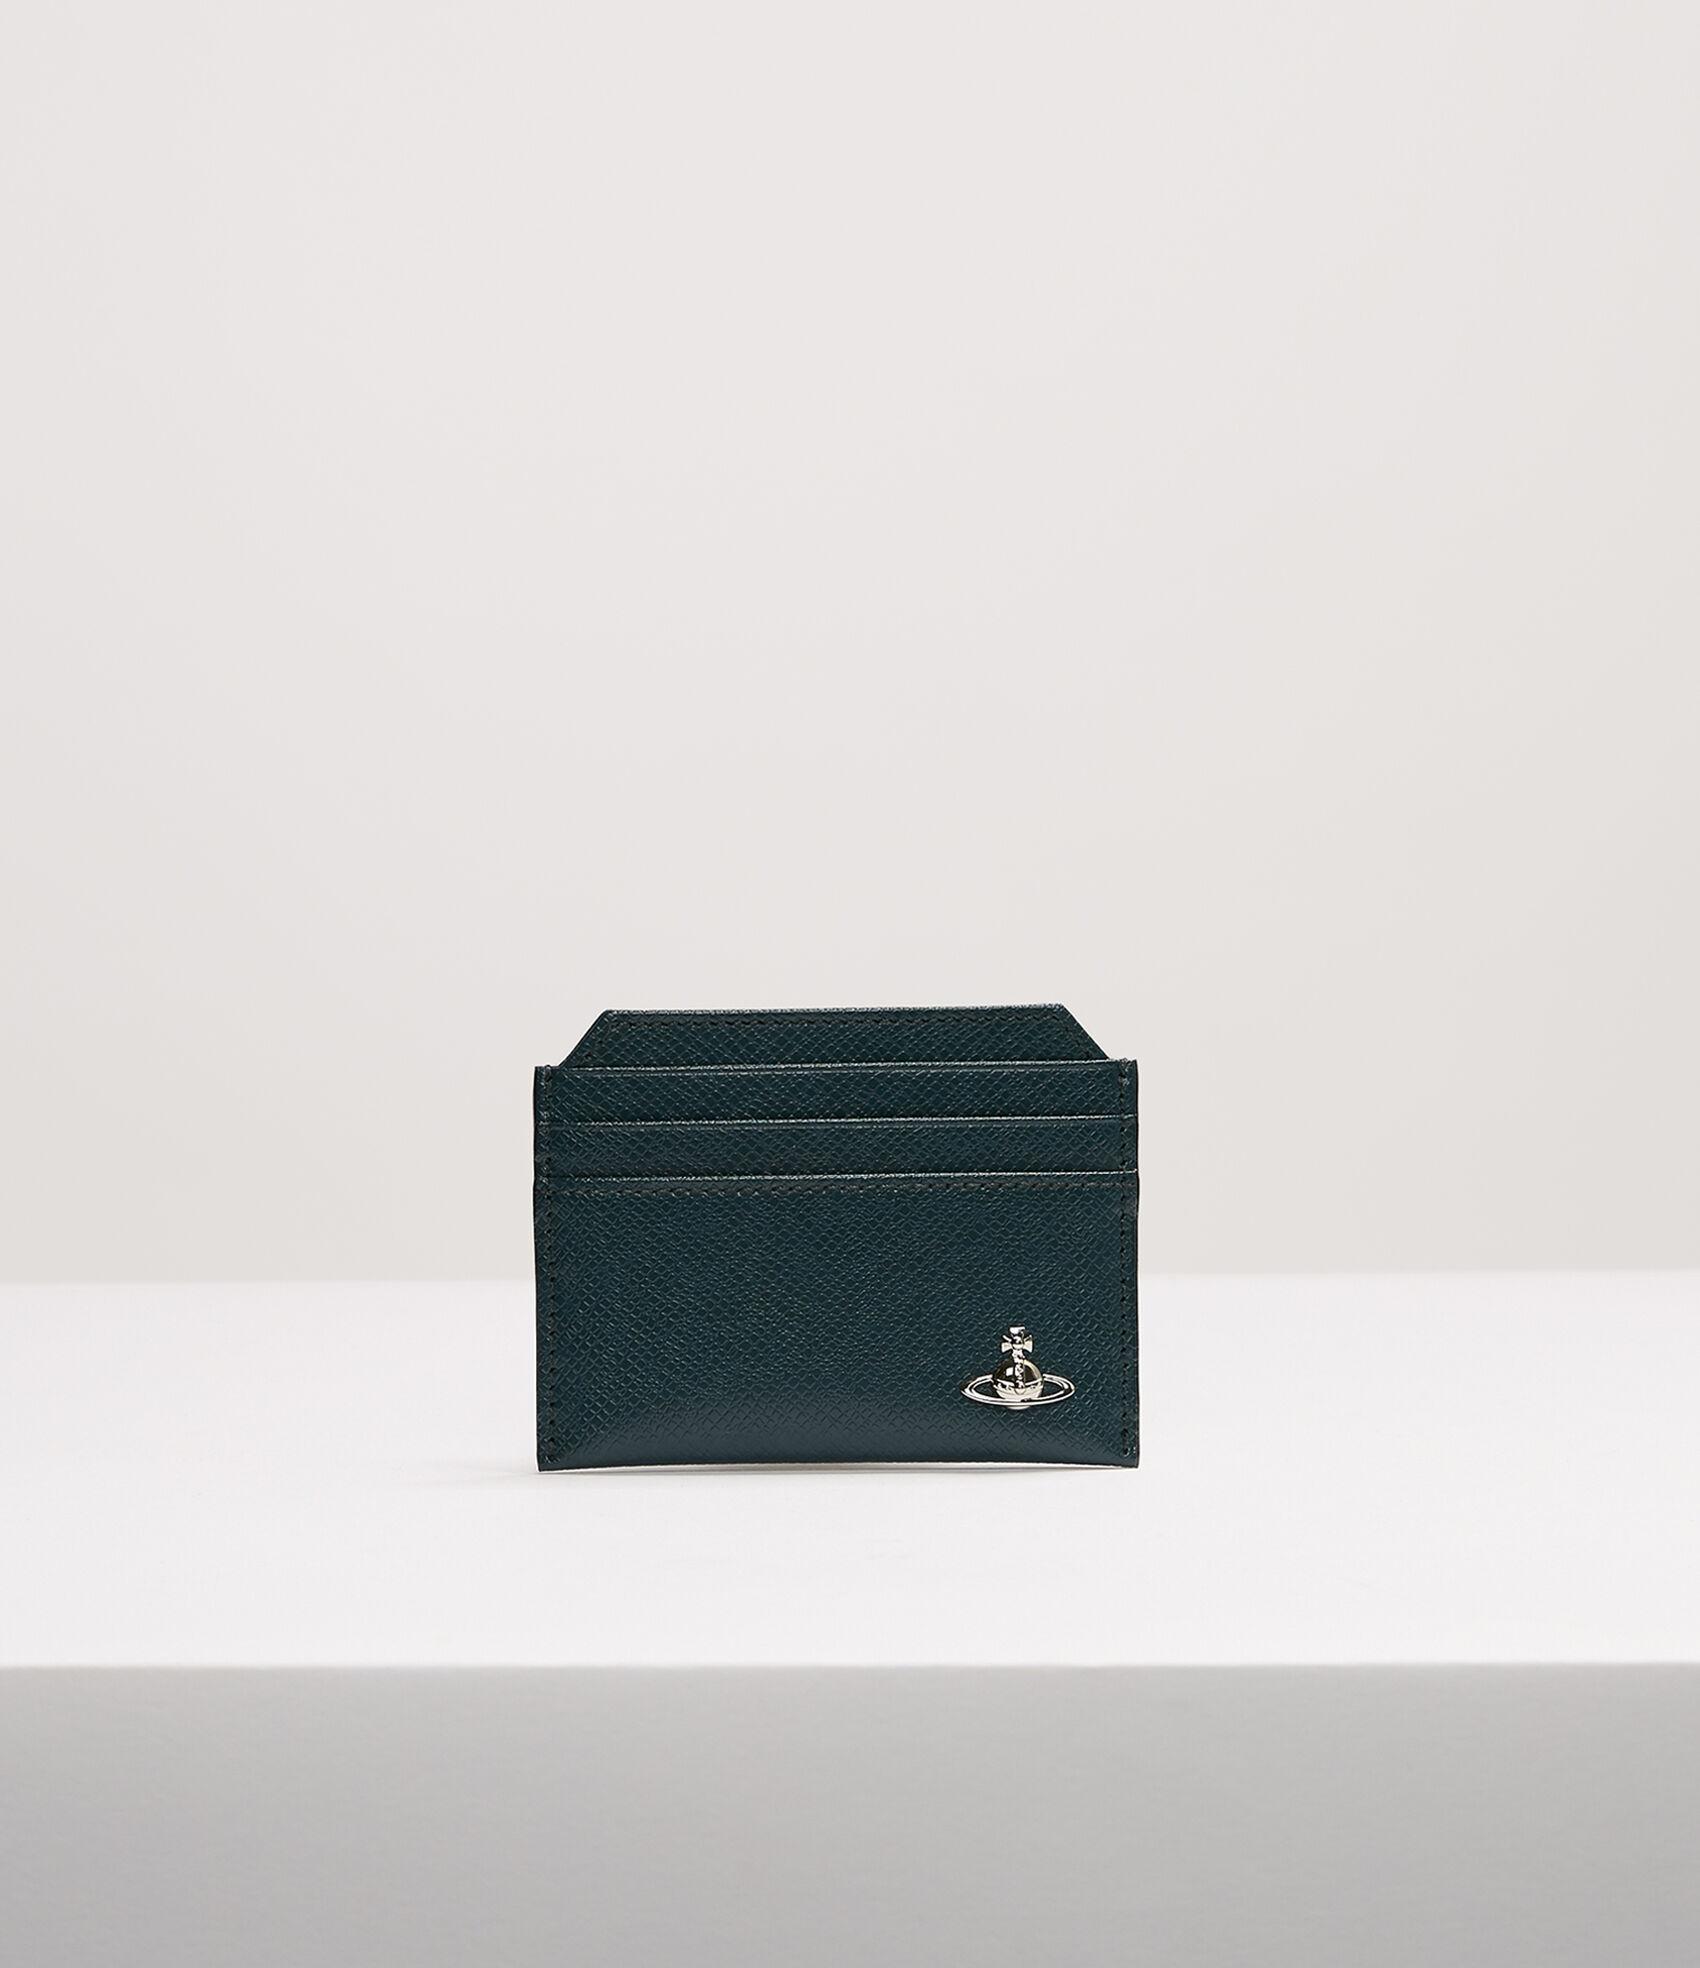 47cbef4cd89 Vivienne Westwood Men s Designer Wallets